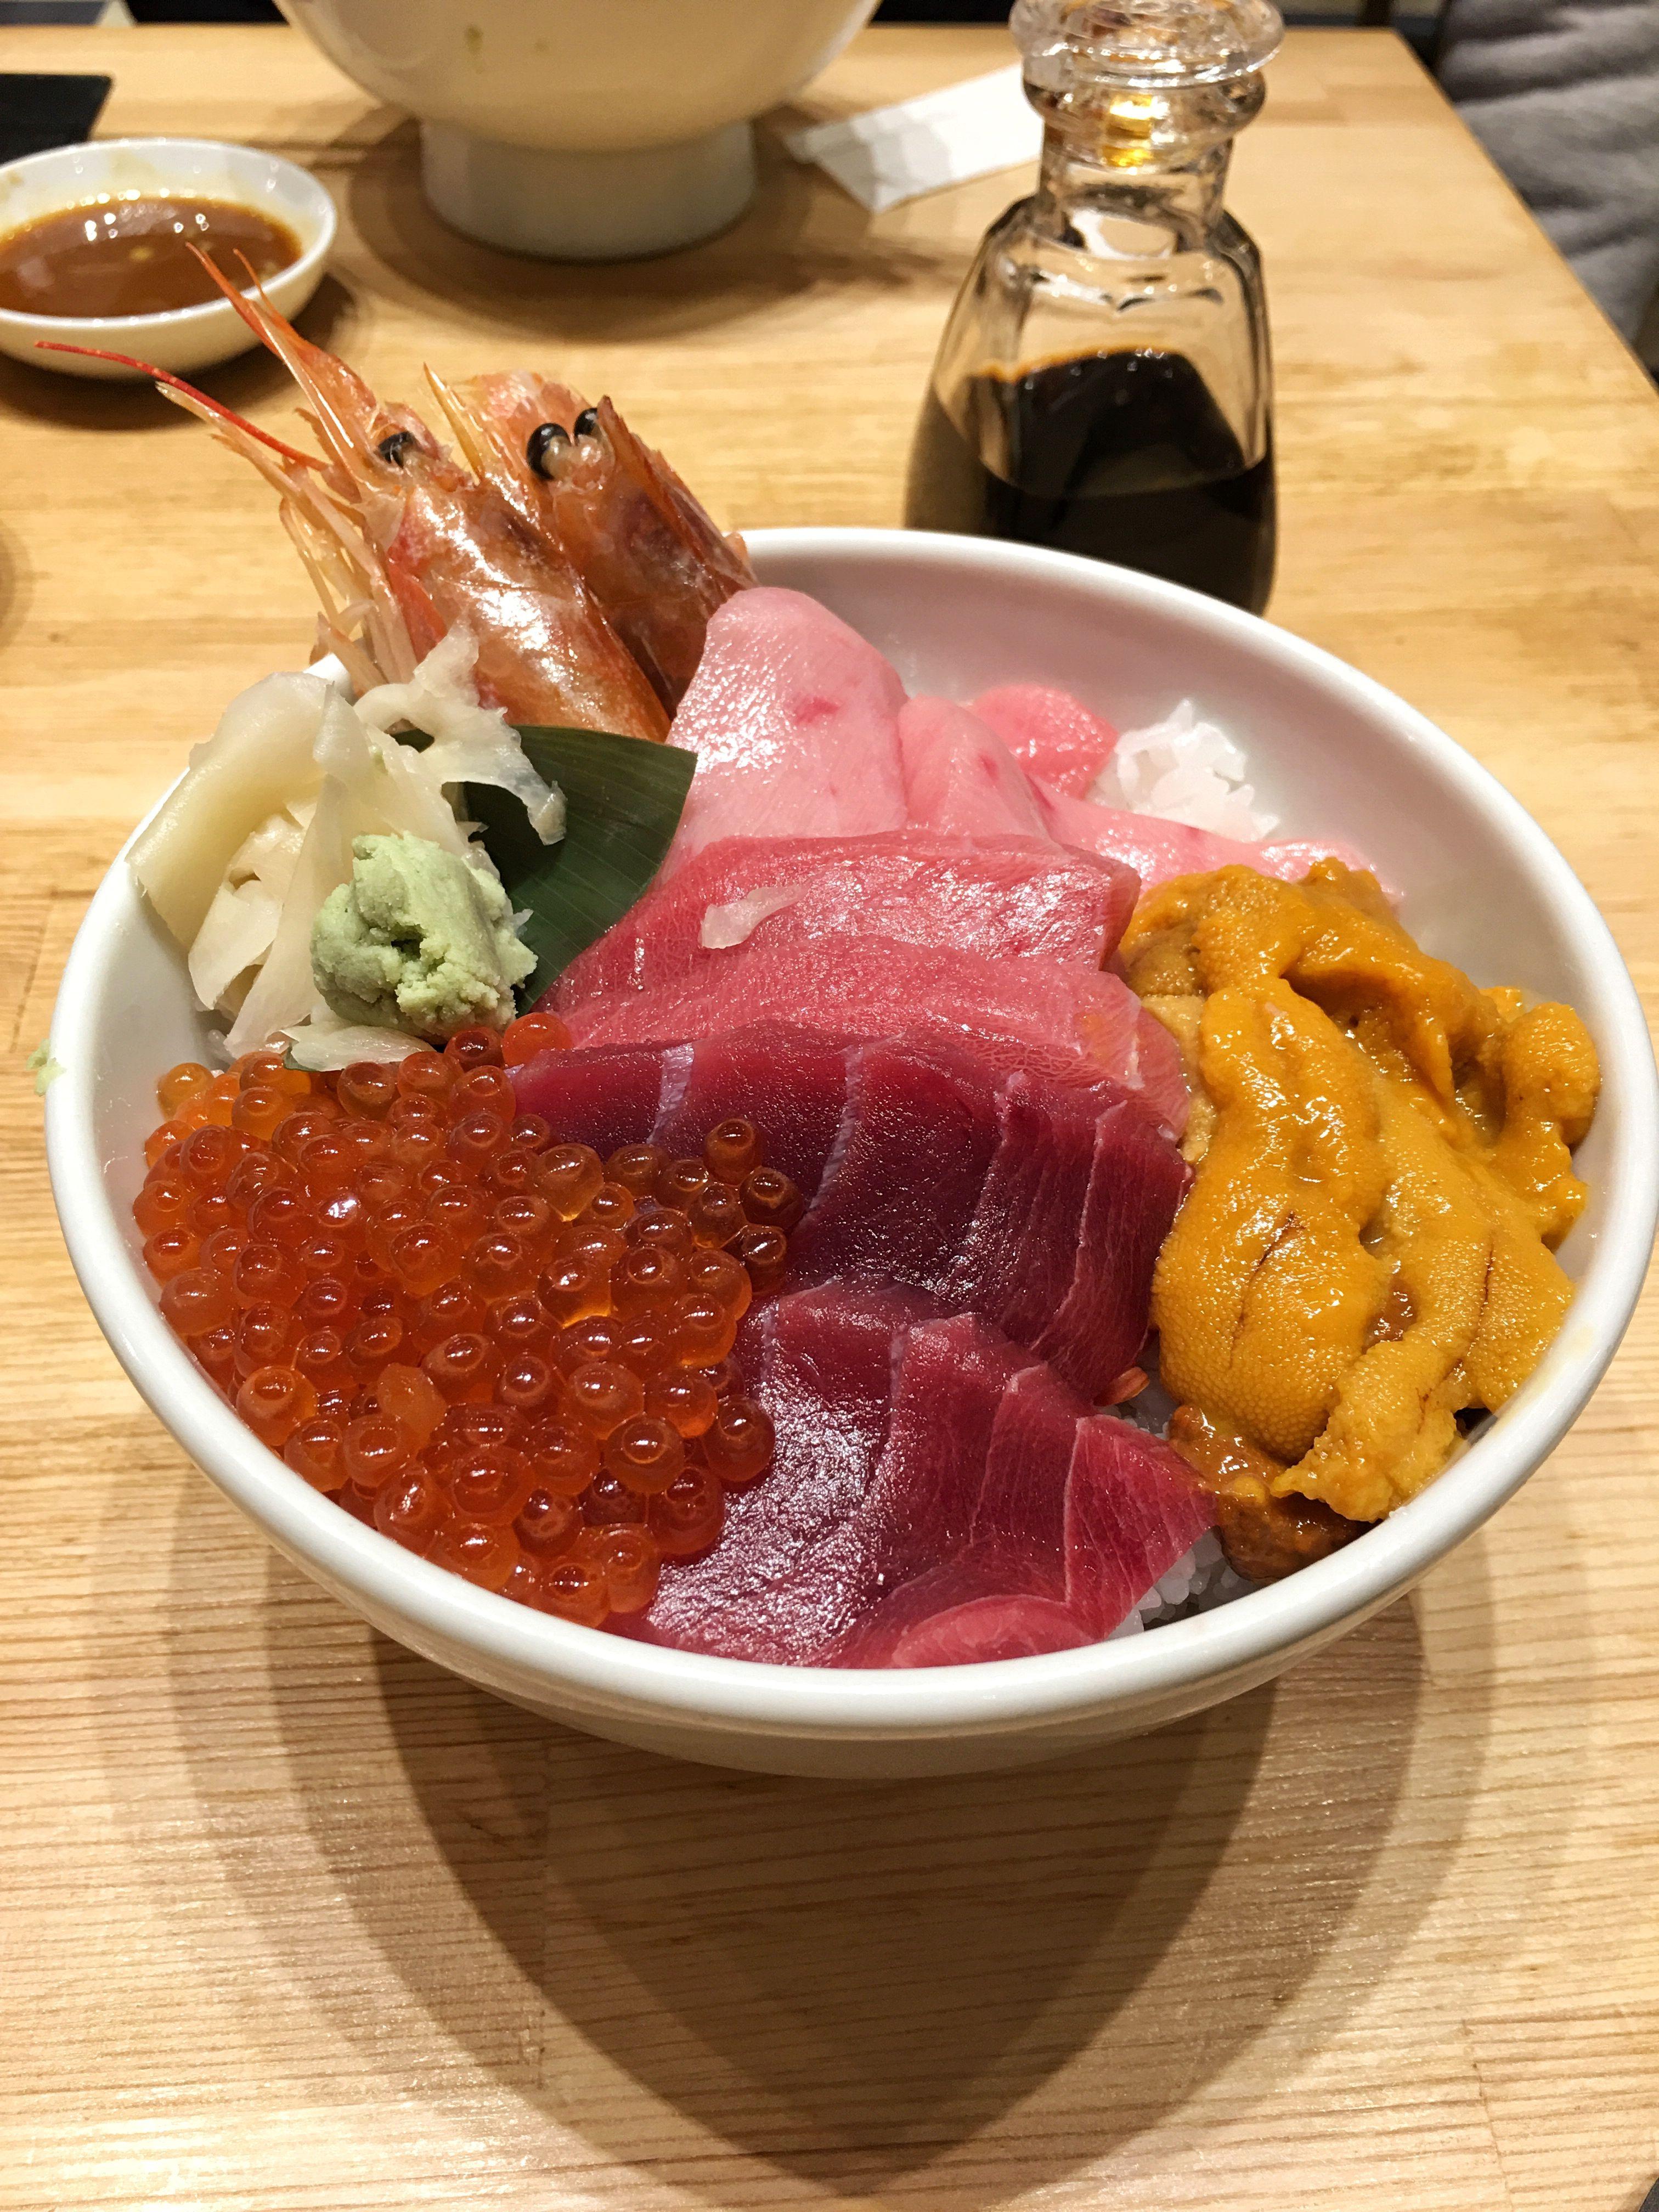 First time exploring Tsukiji fish market - best Chirashi I have ever had (Japanese Sashimi bowl)